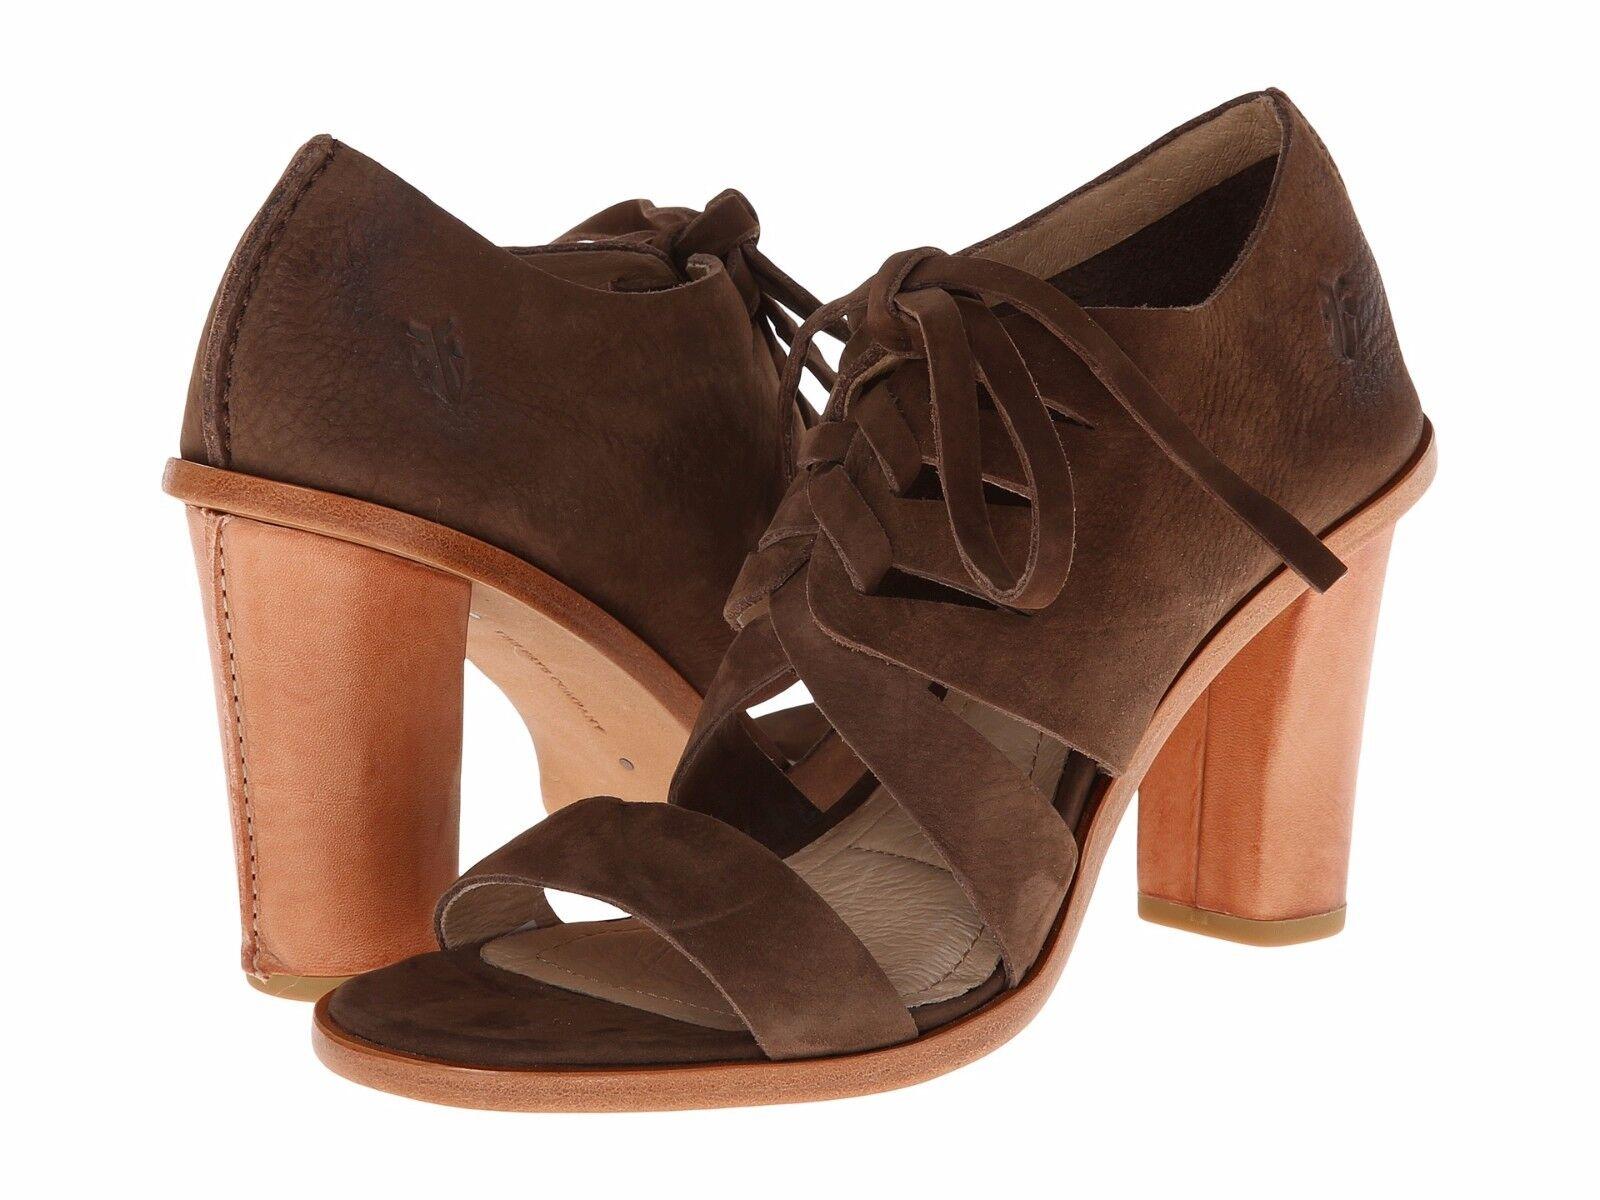 New Frye Sofia Tie On dark brown women's shoes size 8